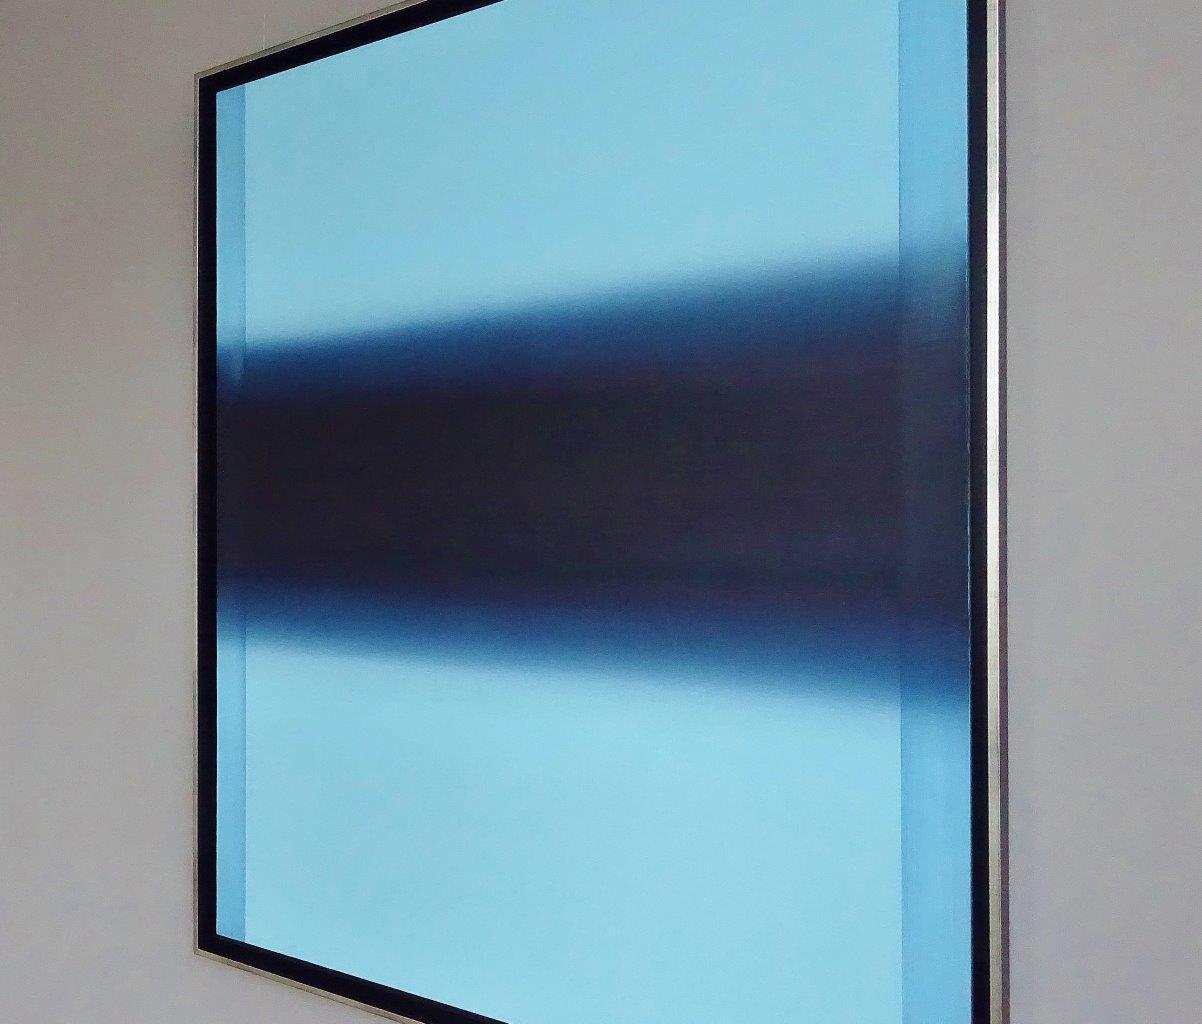 Anna Podlewska : Saturation of blue